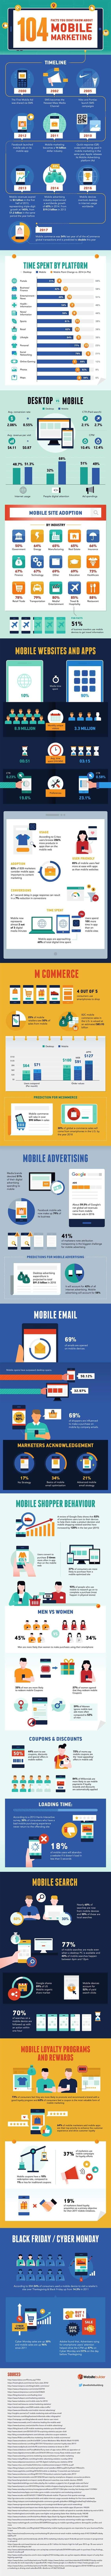 2018 Mobile SEO Infographic